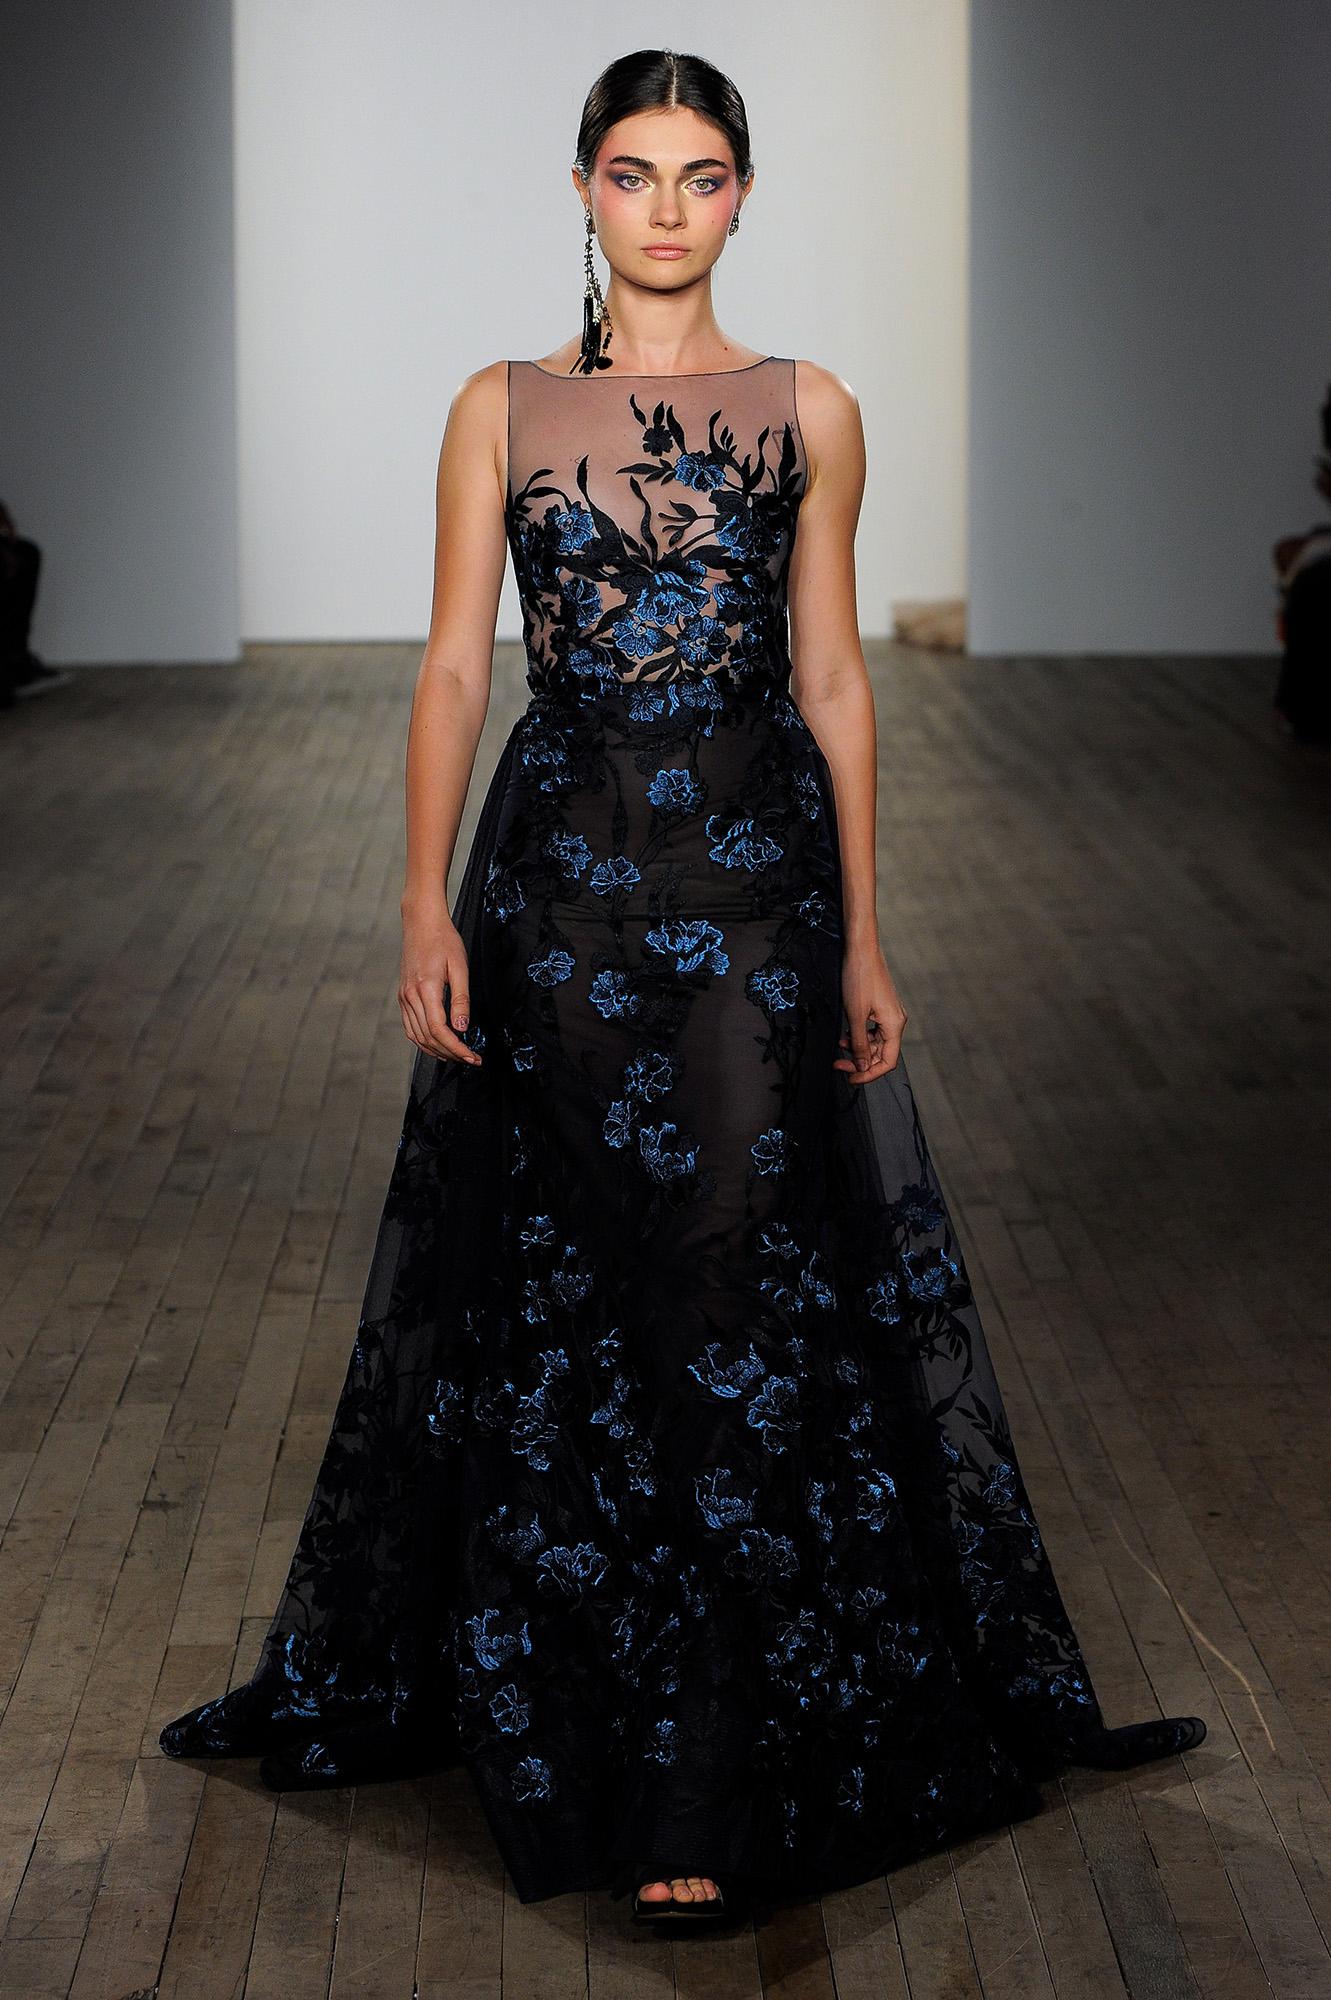 lazaro fall 2019 illusion high neckline floral applique black wedding dress